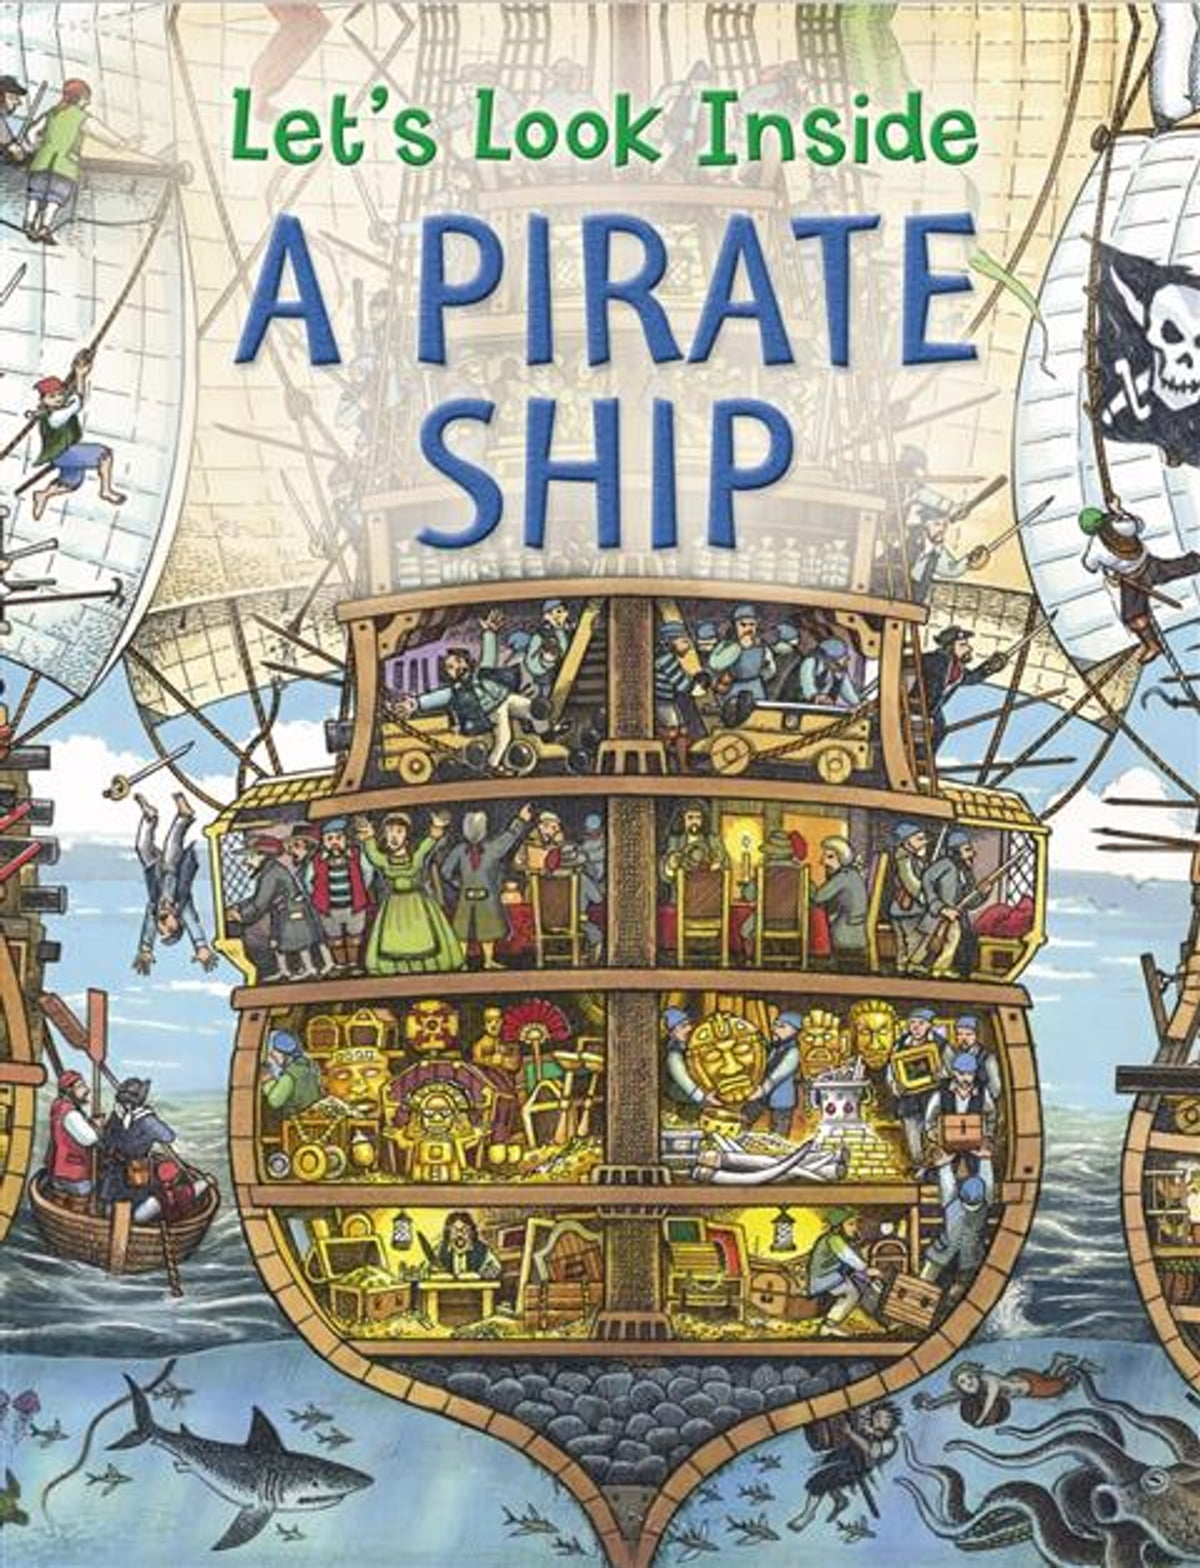 Pirate Ship eBook by Nicholas Harris - 9781912222247 | Rakuten Kobo